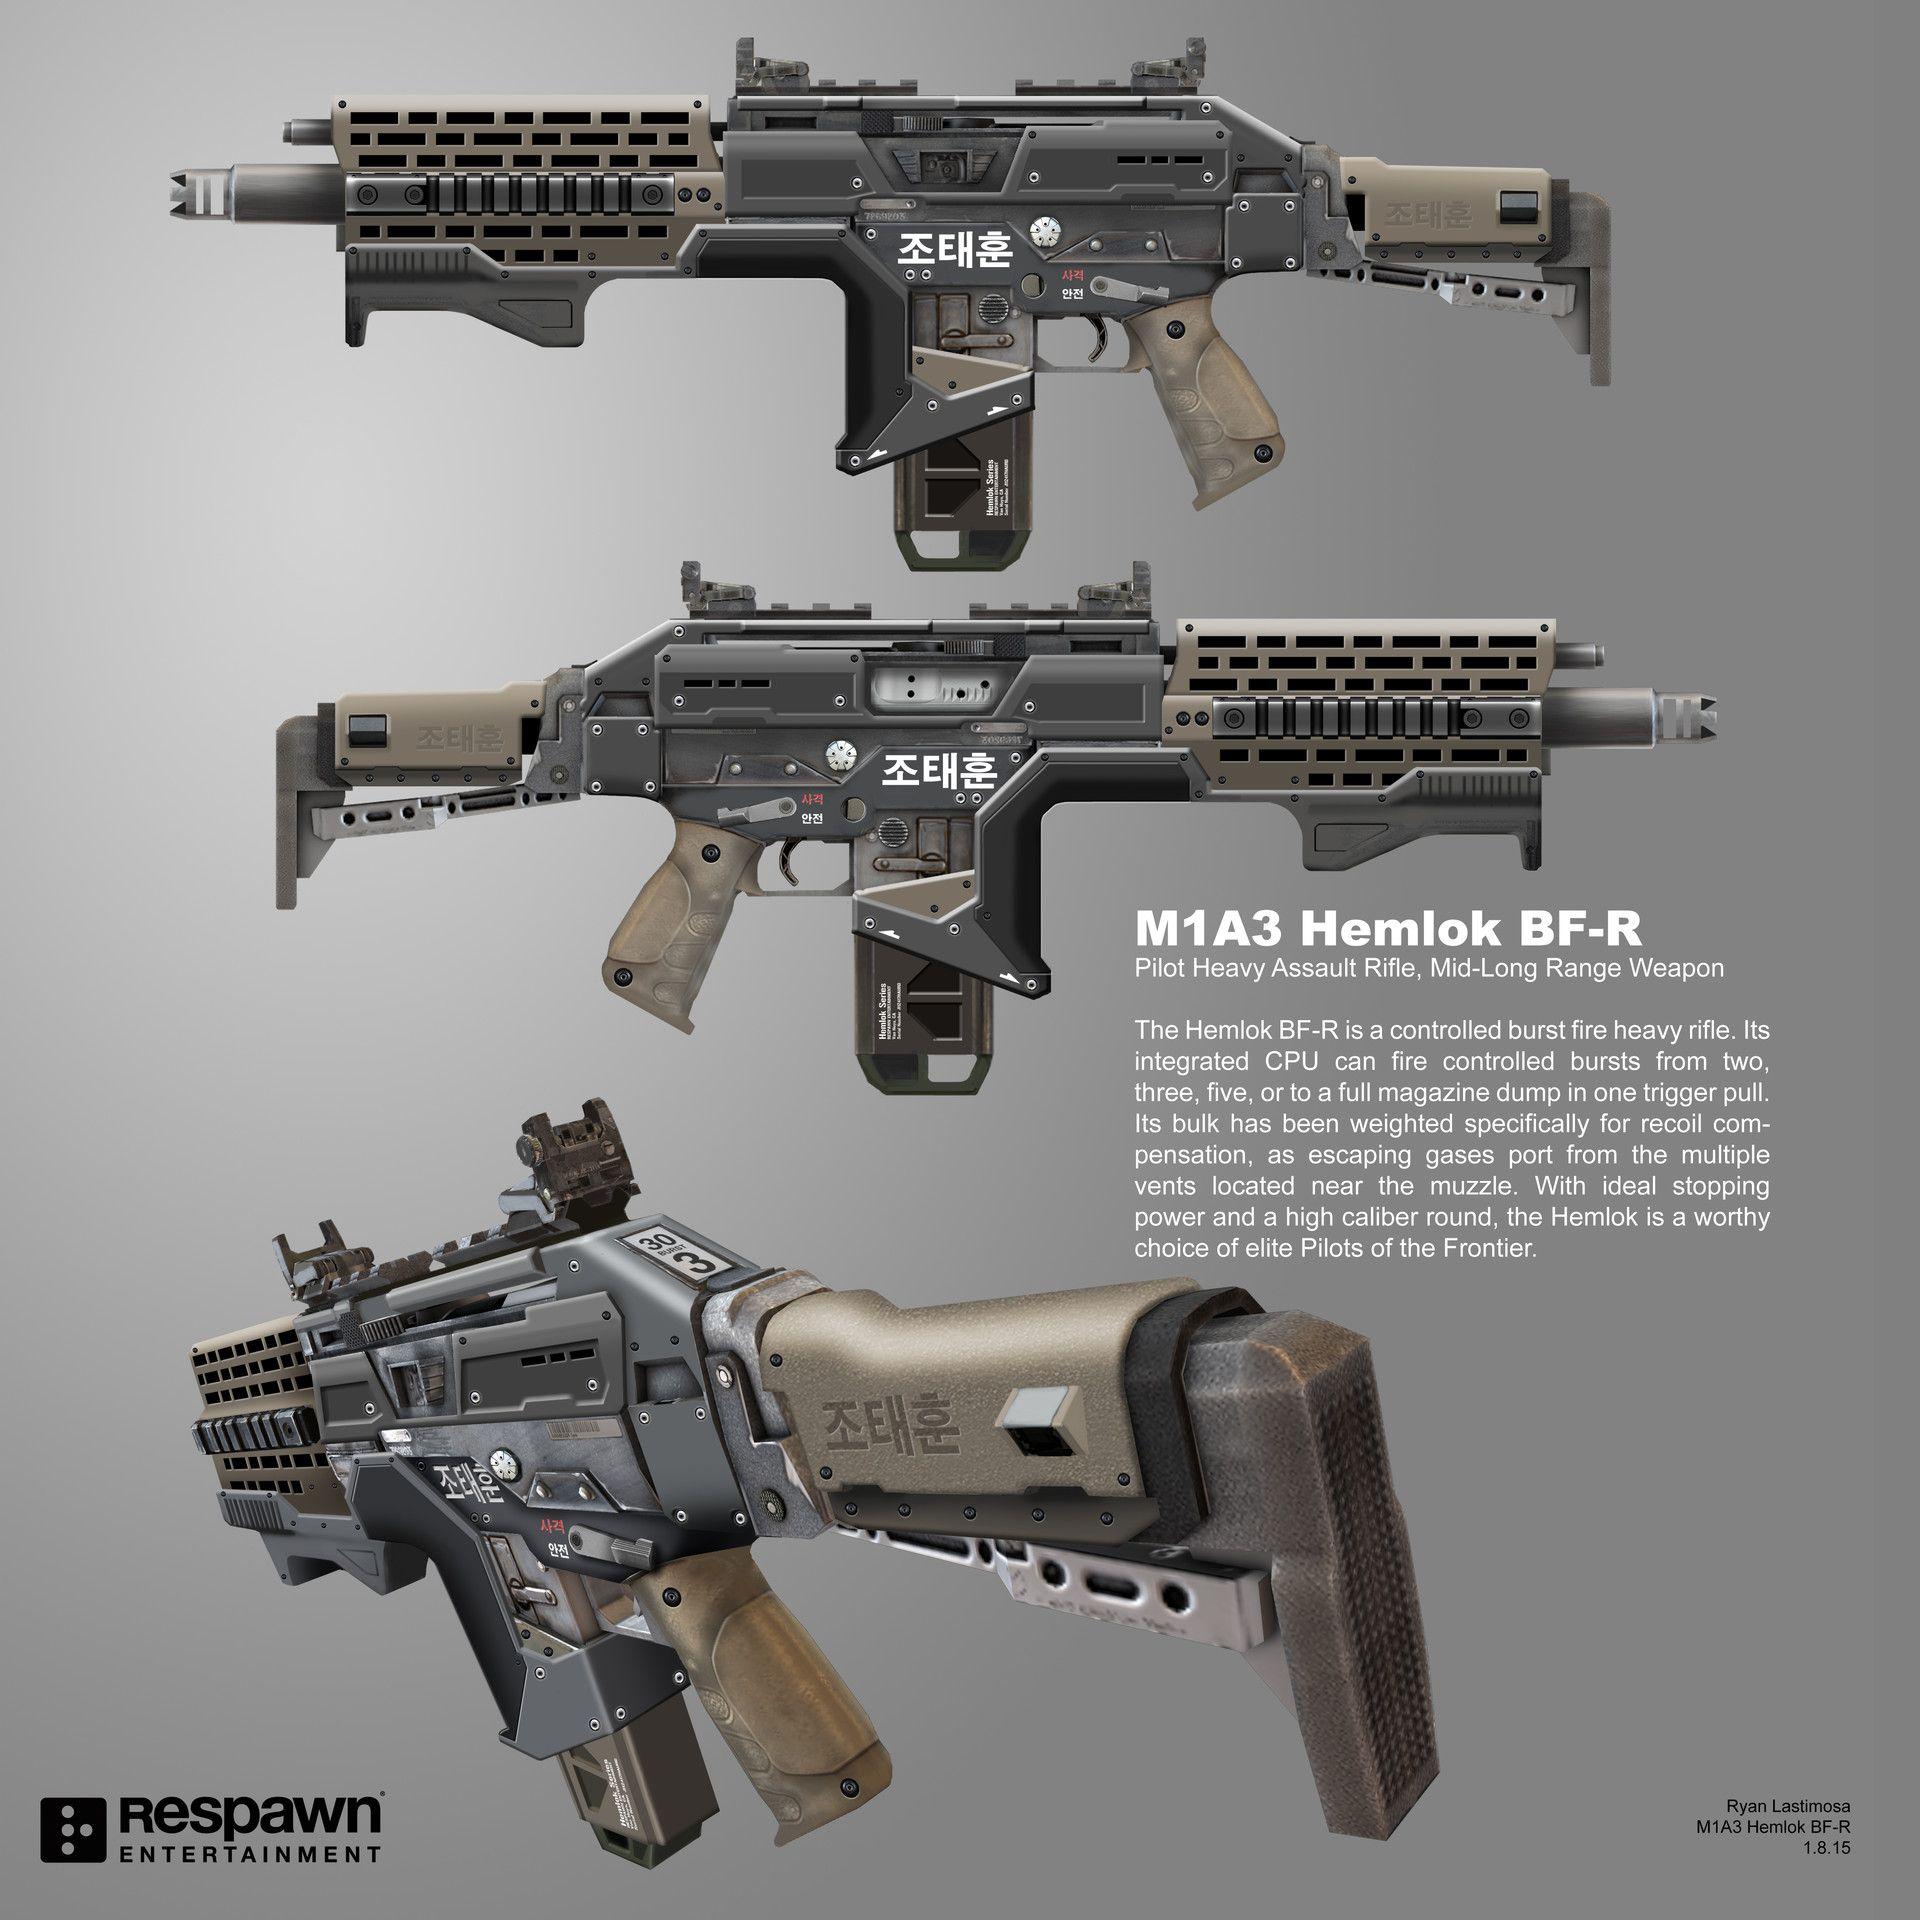 ArtStation - Titanfall 2 M1A3 Hemlok BF-R, Ryan Lastimosa ...